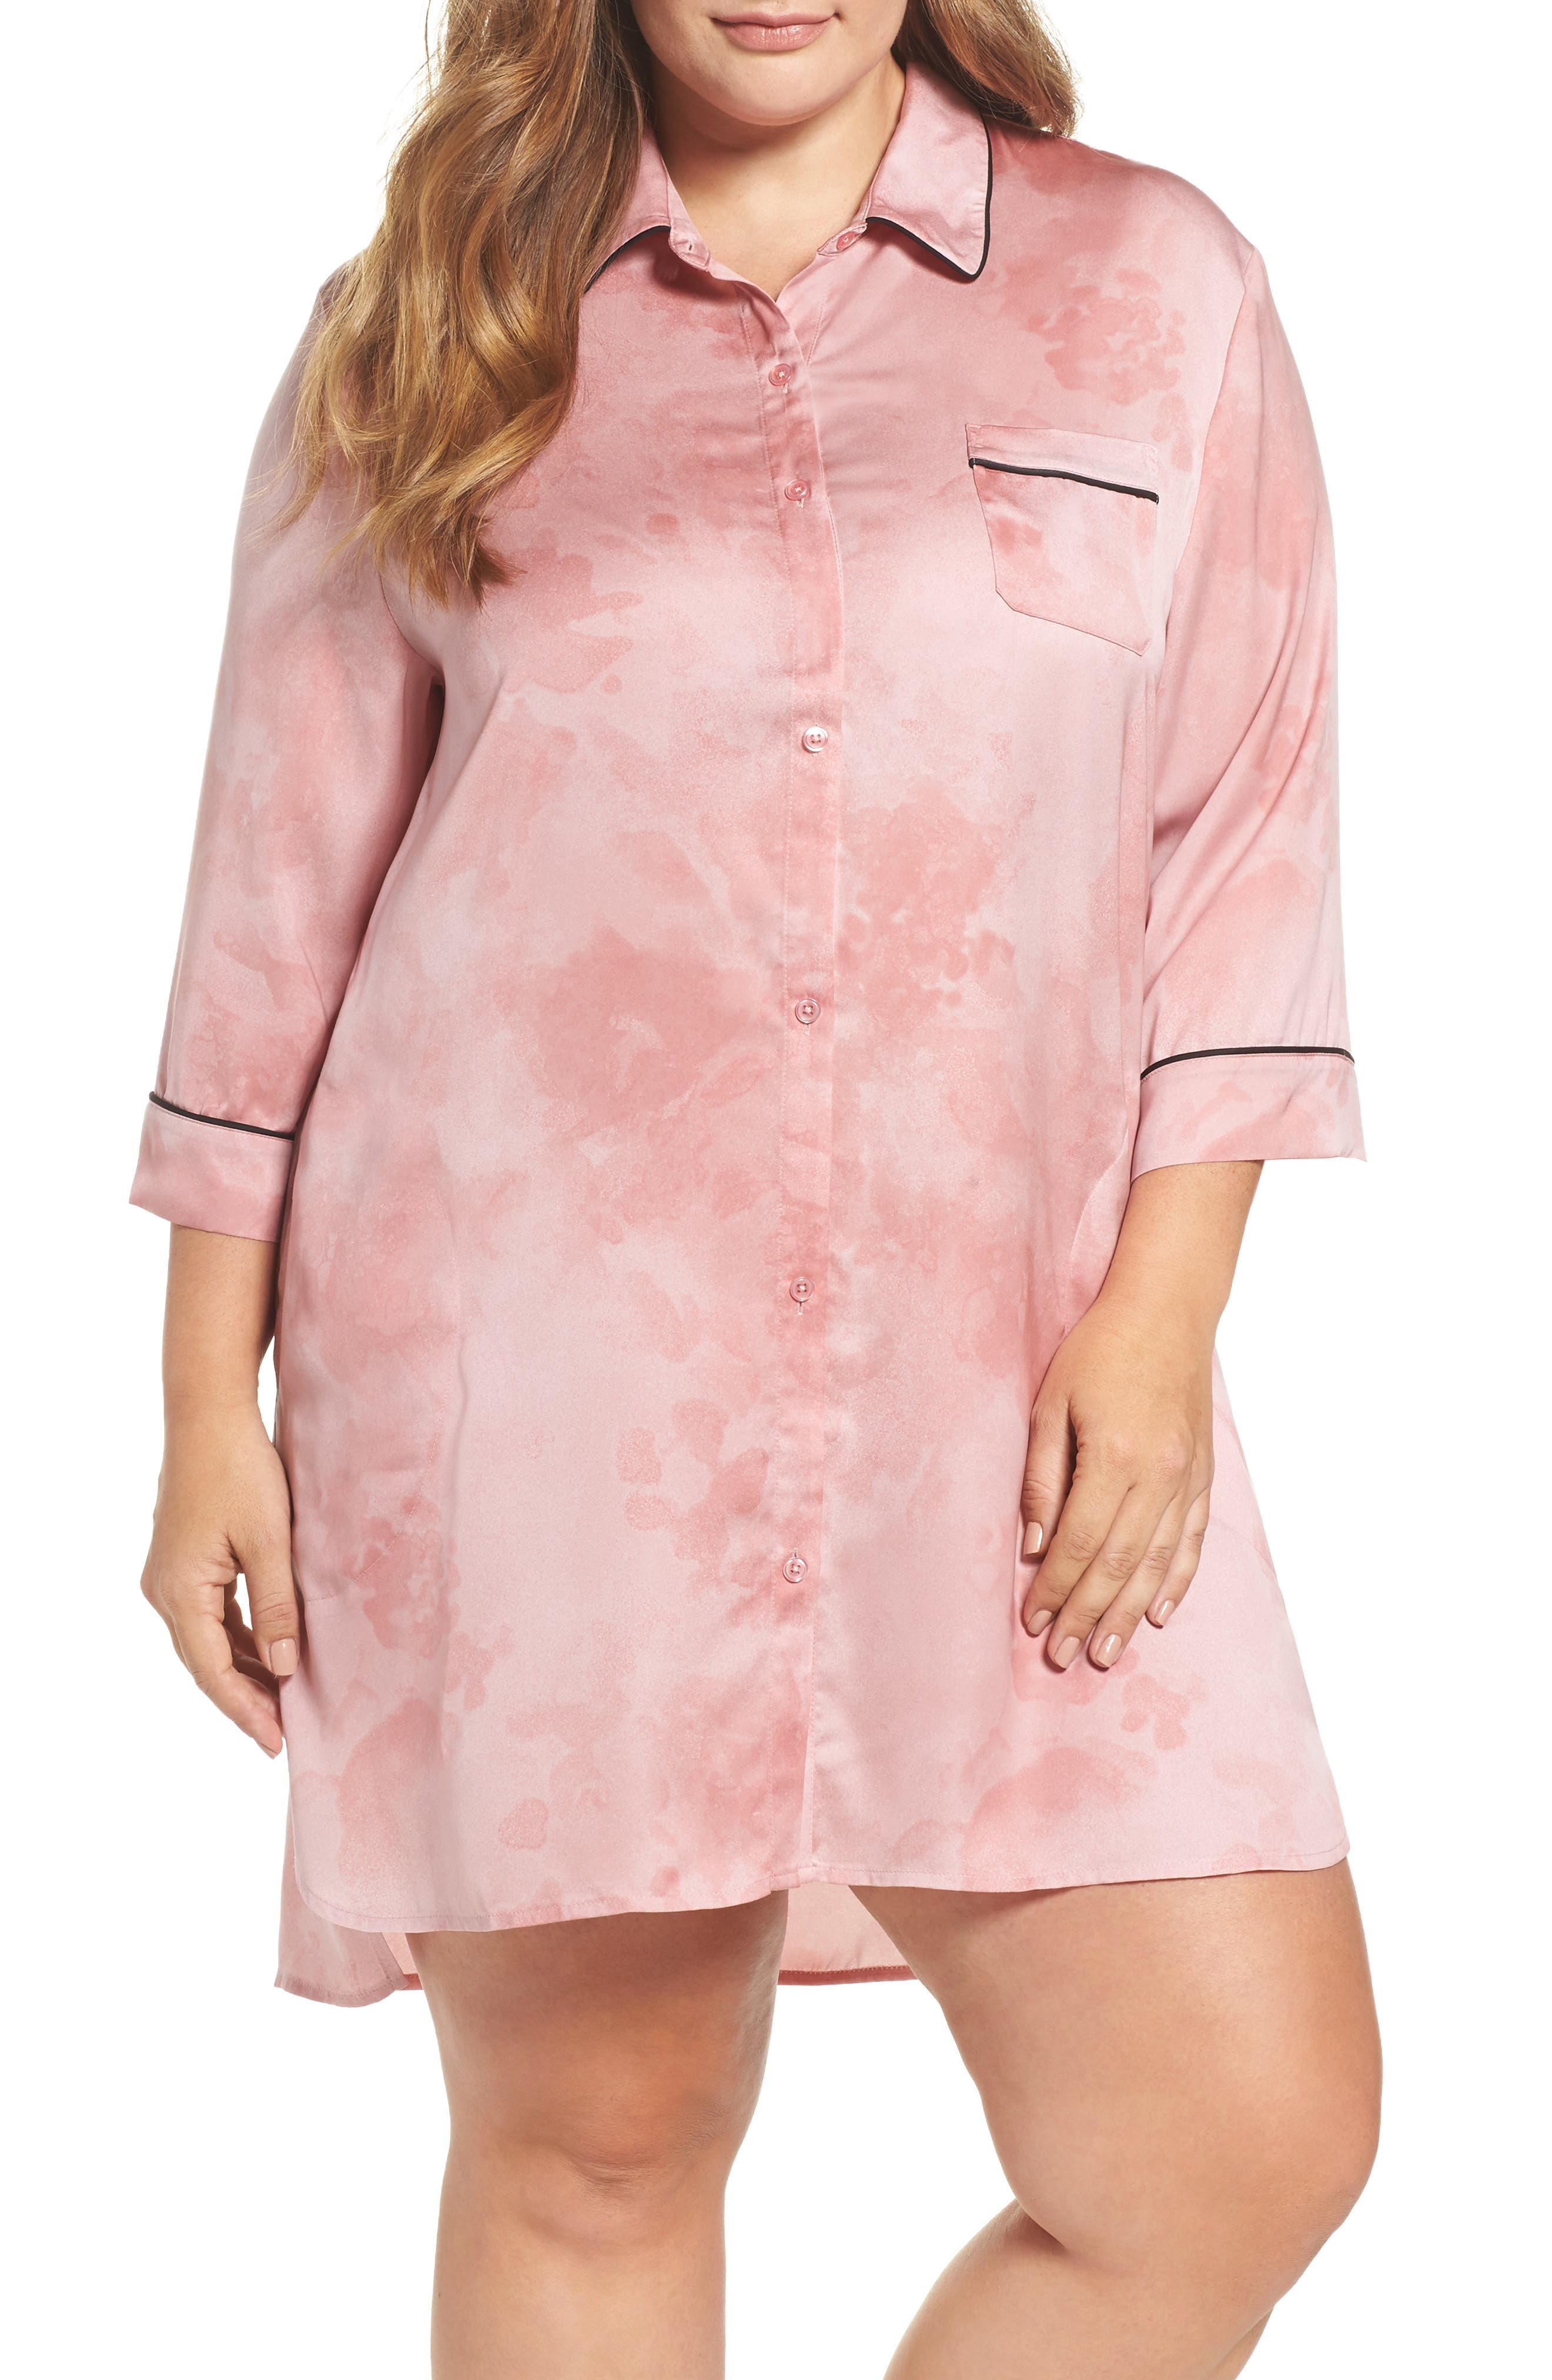 Washed Satin Sleep Shirt,                         Main,                         color, Pink Floral